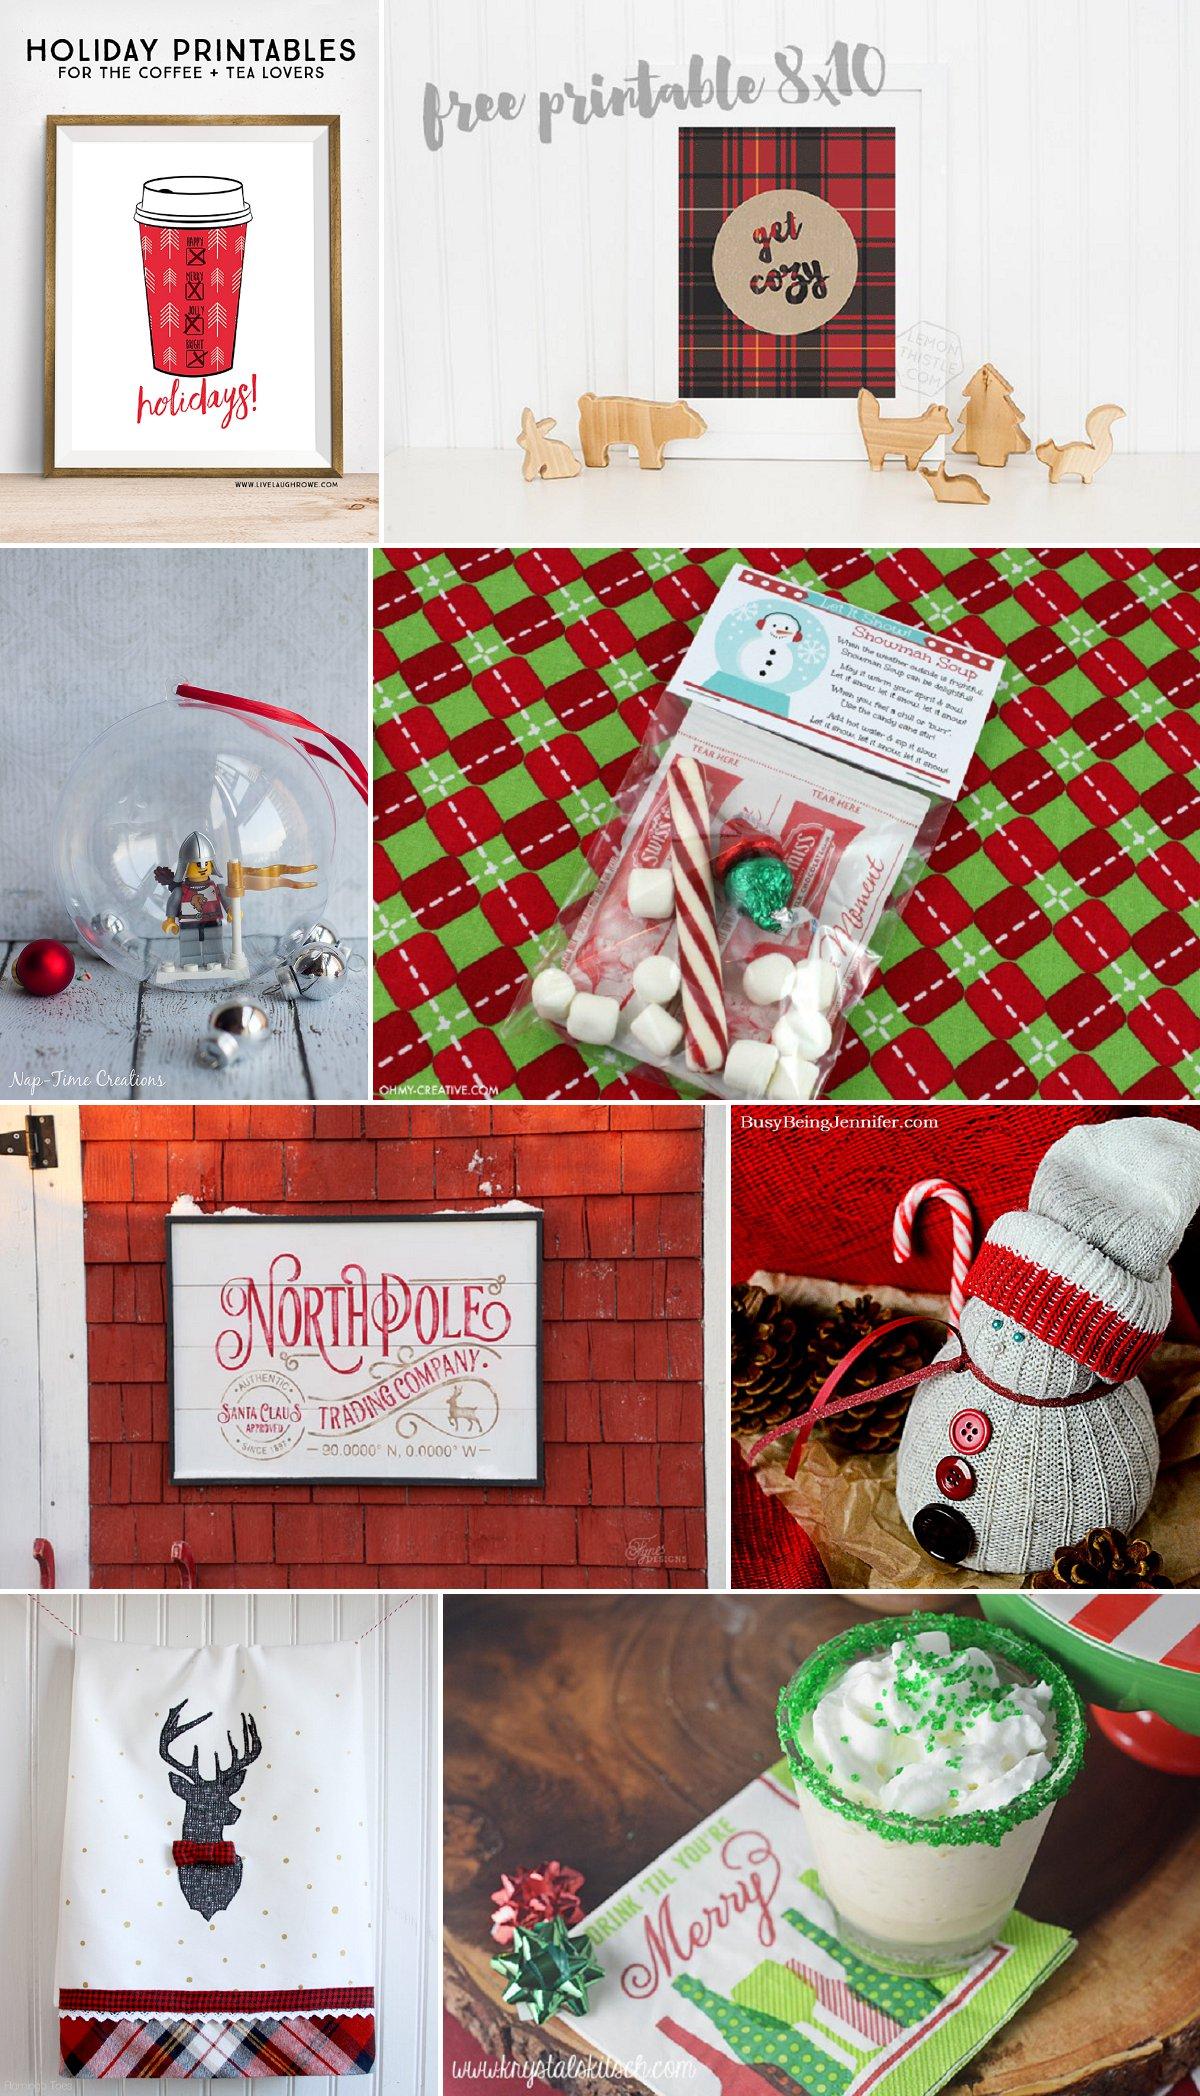 Christmas Printables Recipes And More